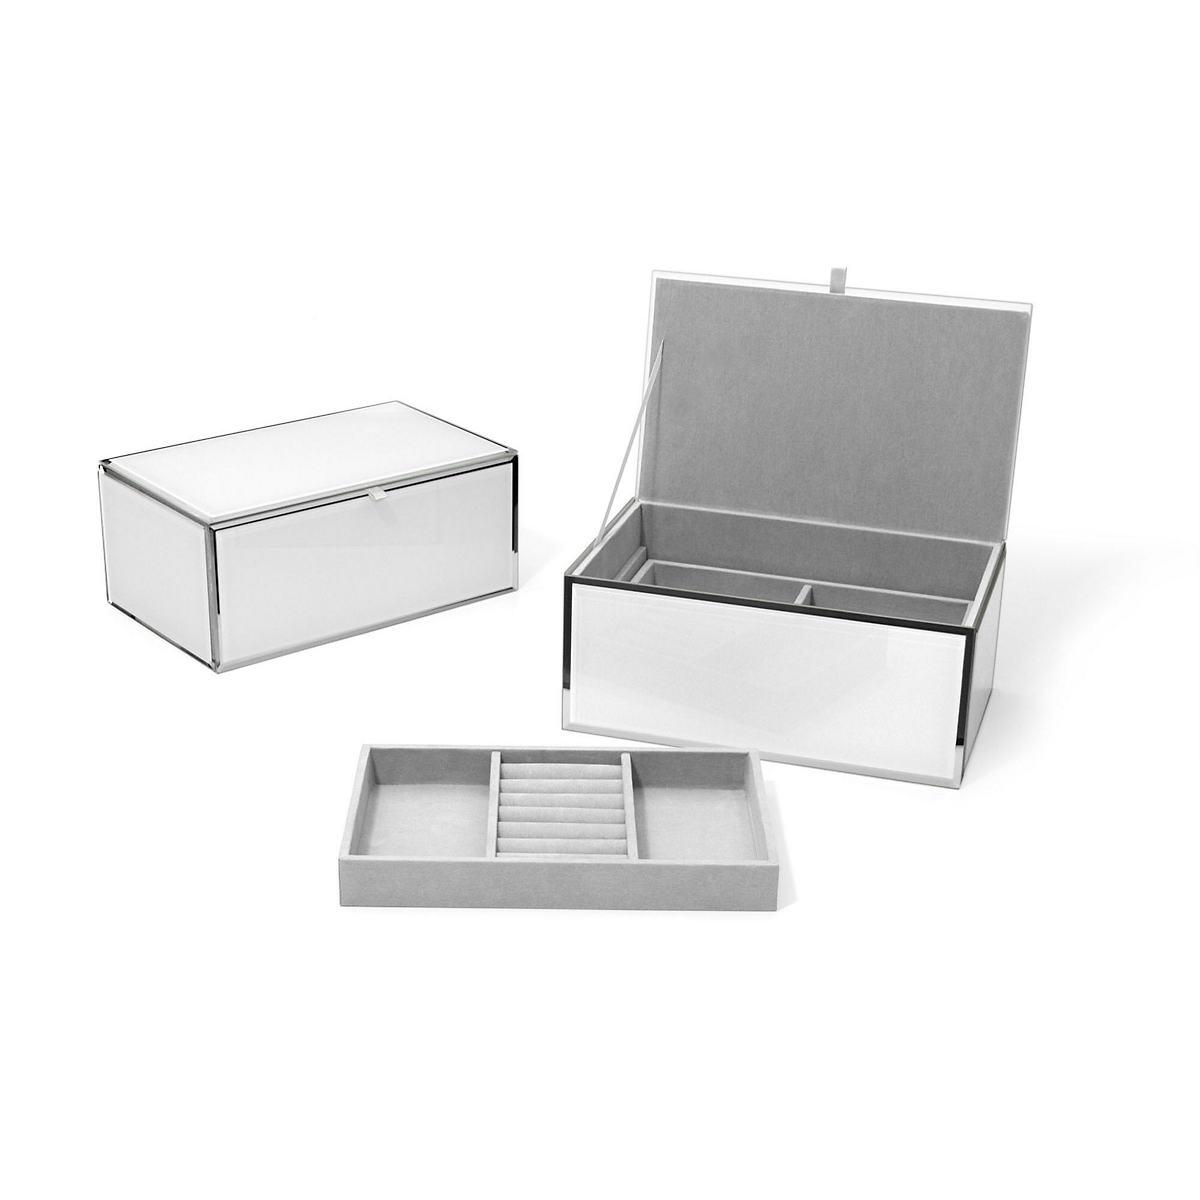 Mia Jewelry Box